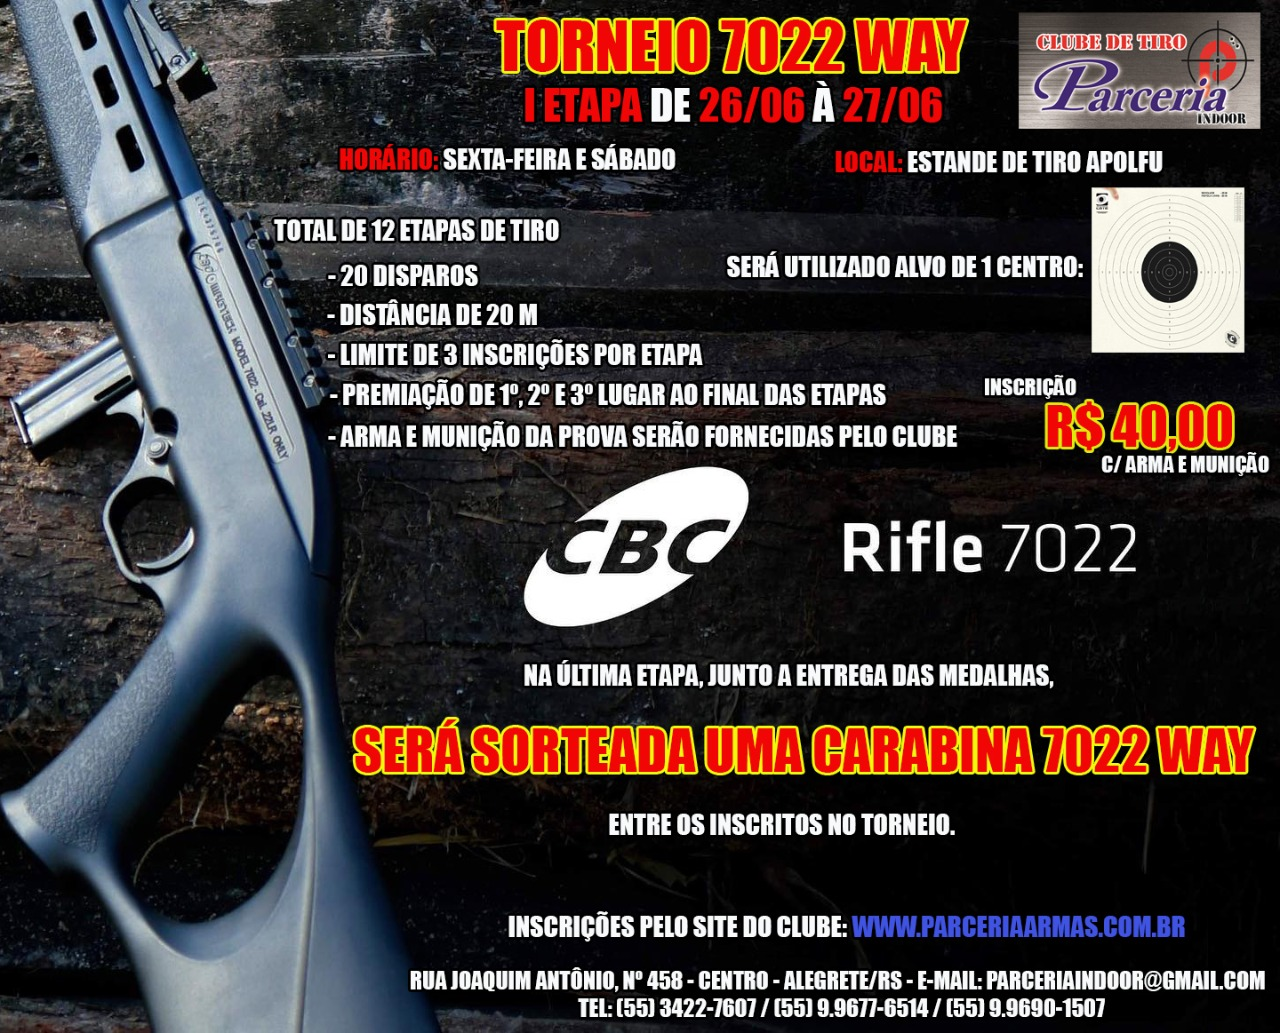 TORNEIO 7022 WAY